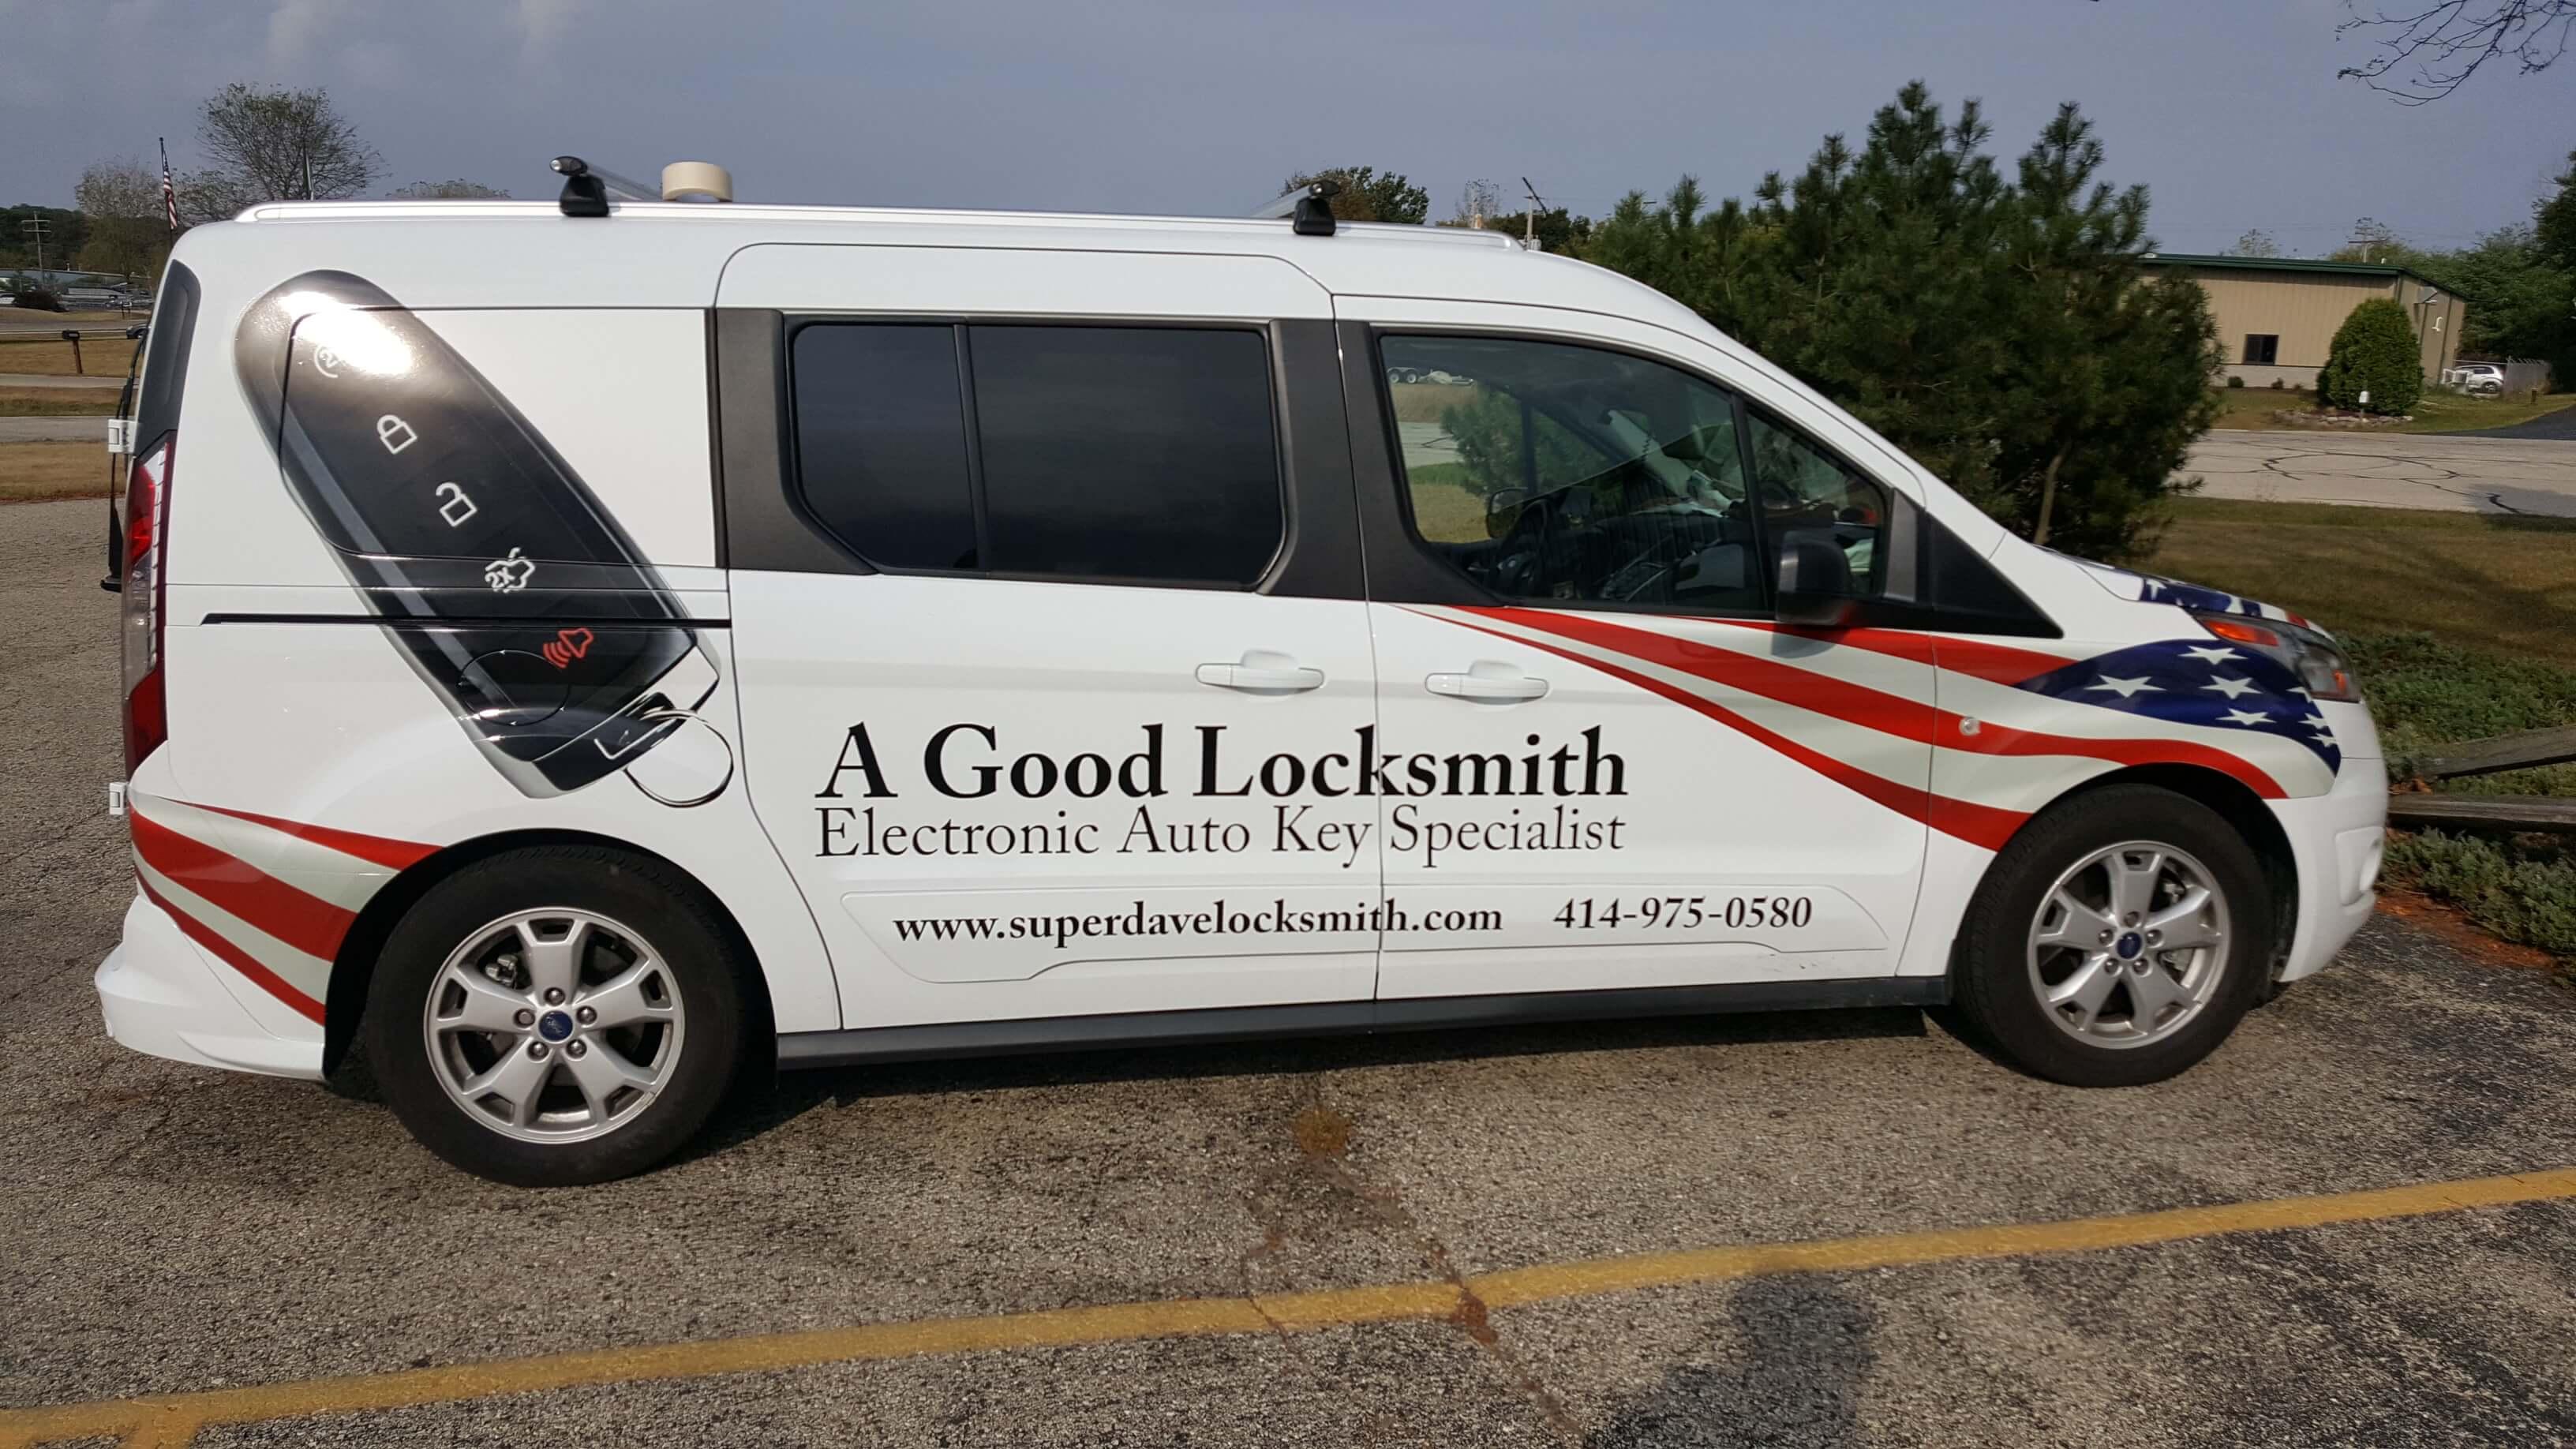 A good locksmith company van graphics